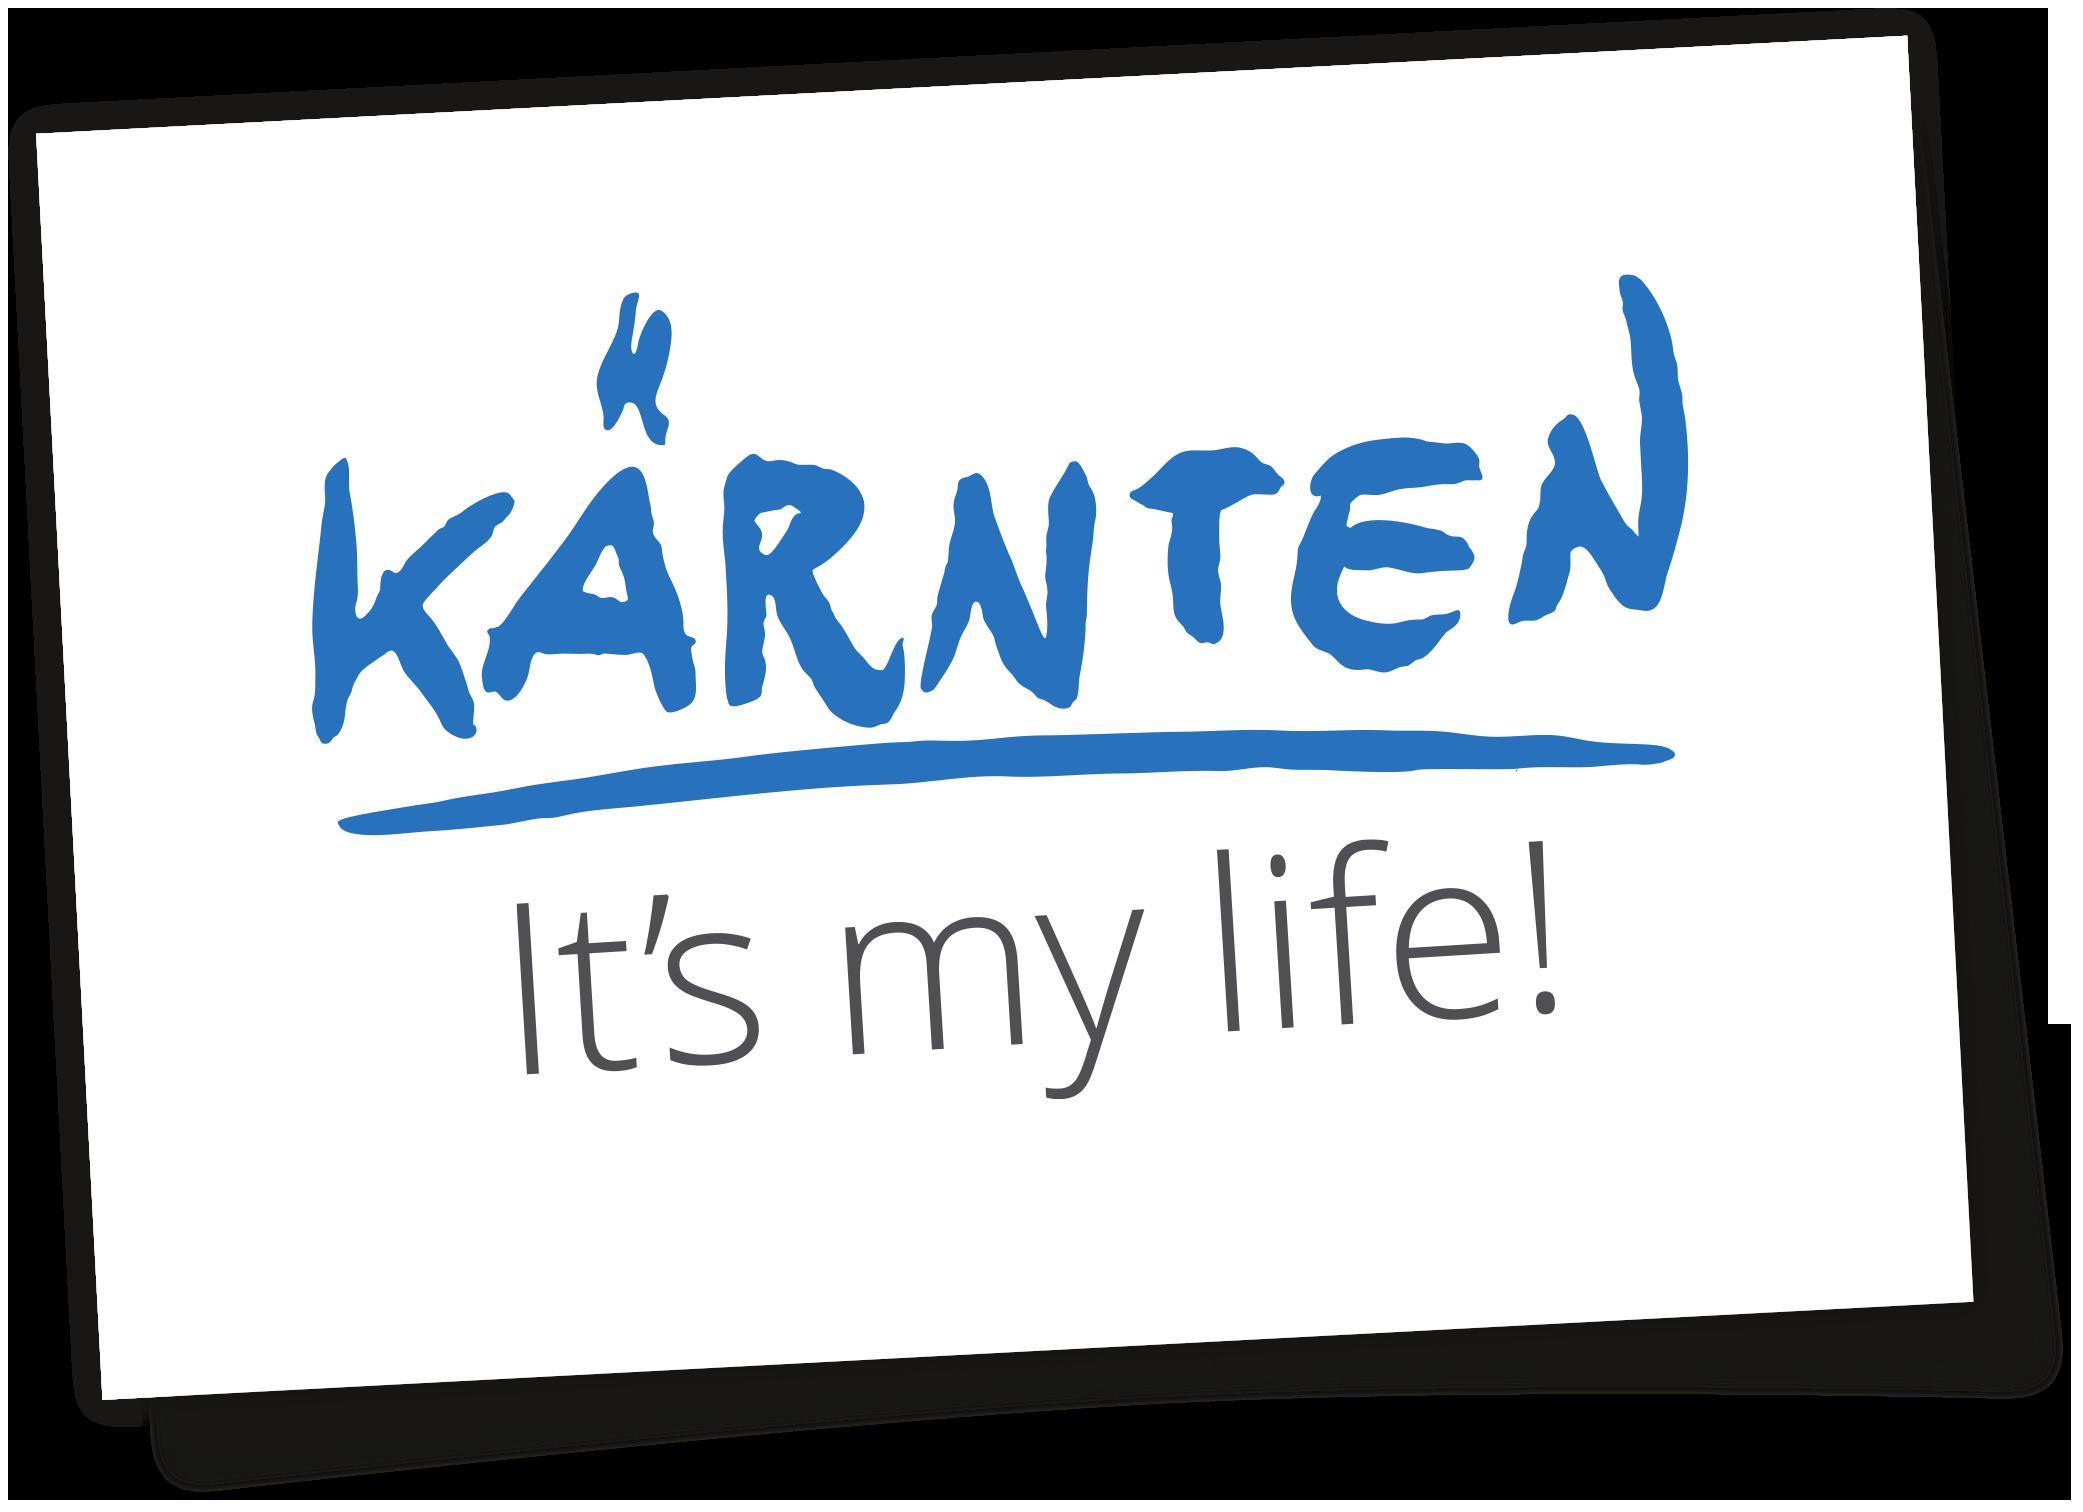 Logo Kärnten - It's my life!